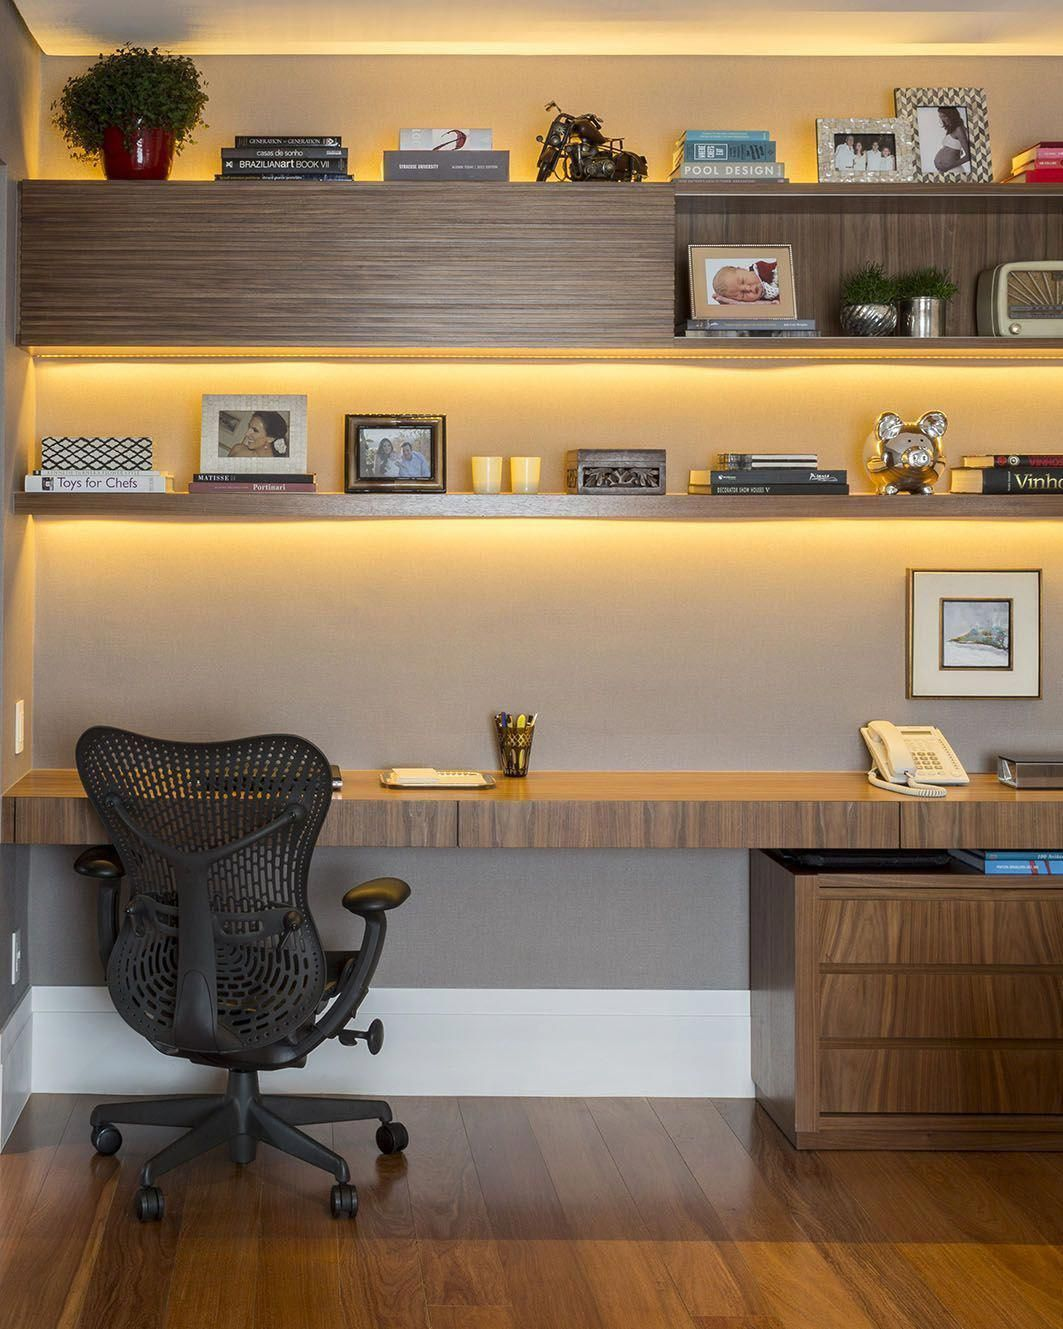 Country Home Decor Contemporary Home Office Office Room Wall Decor 20190323 Contemporary Home Office Home Office Design Home Office Decor